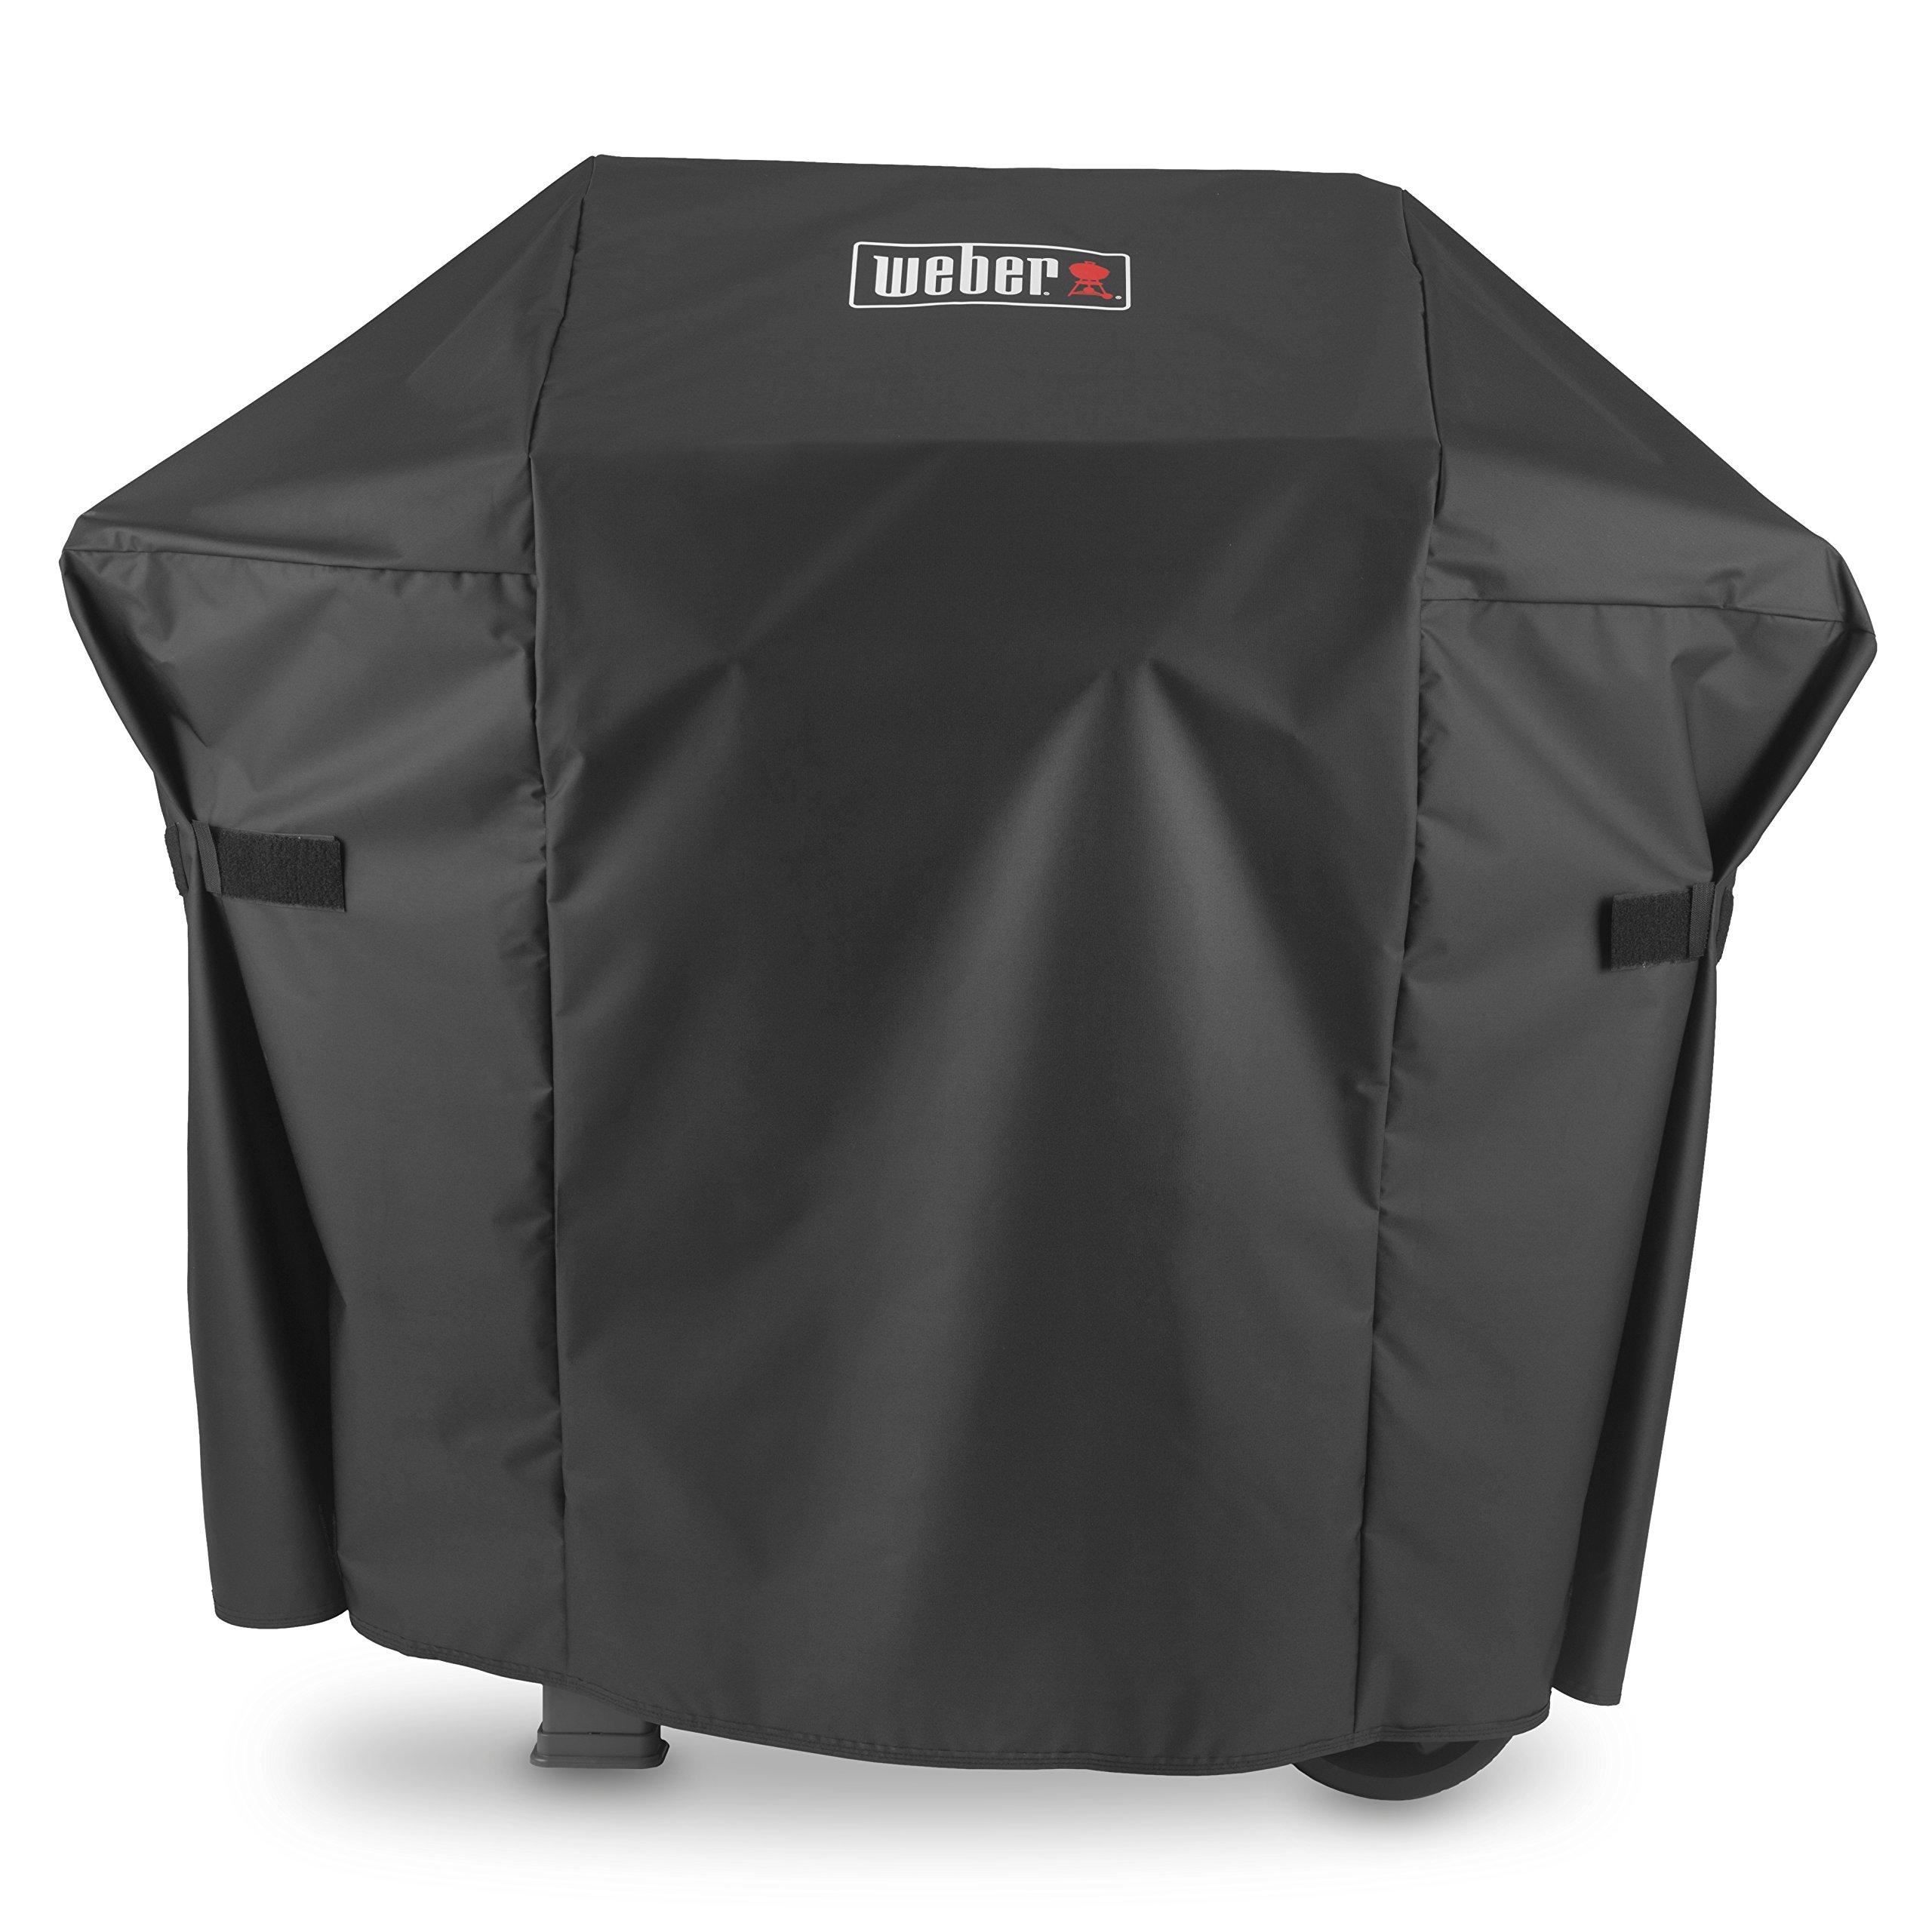 Weber 7138 Premium Cover Spirit II 200 Grill Accessory